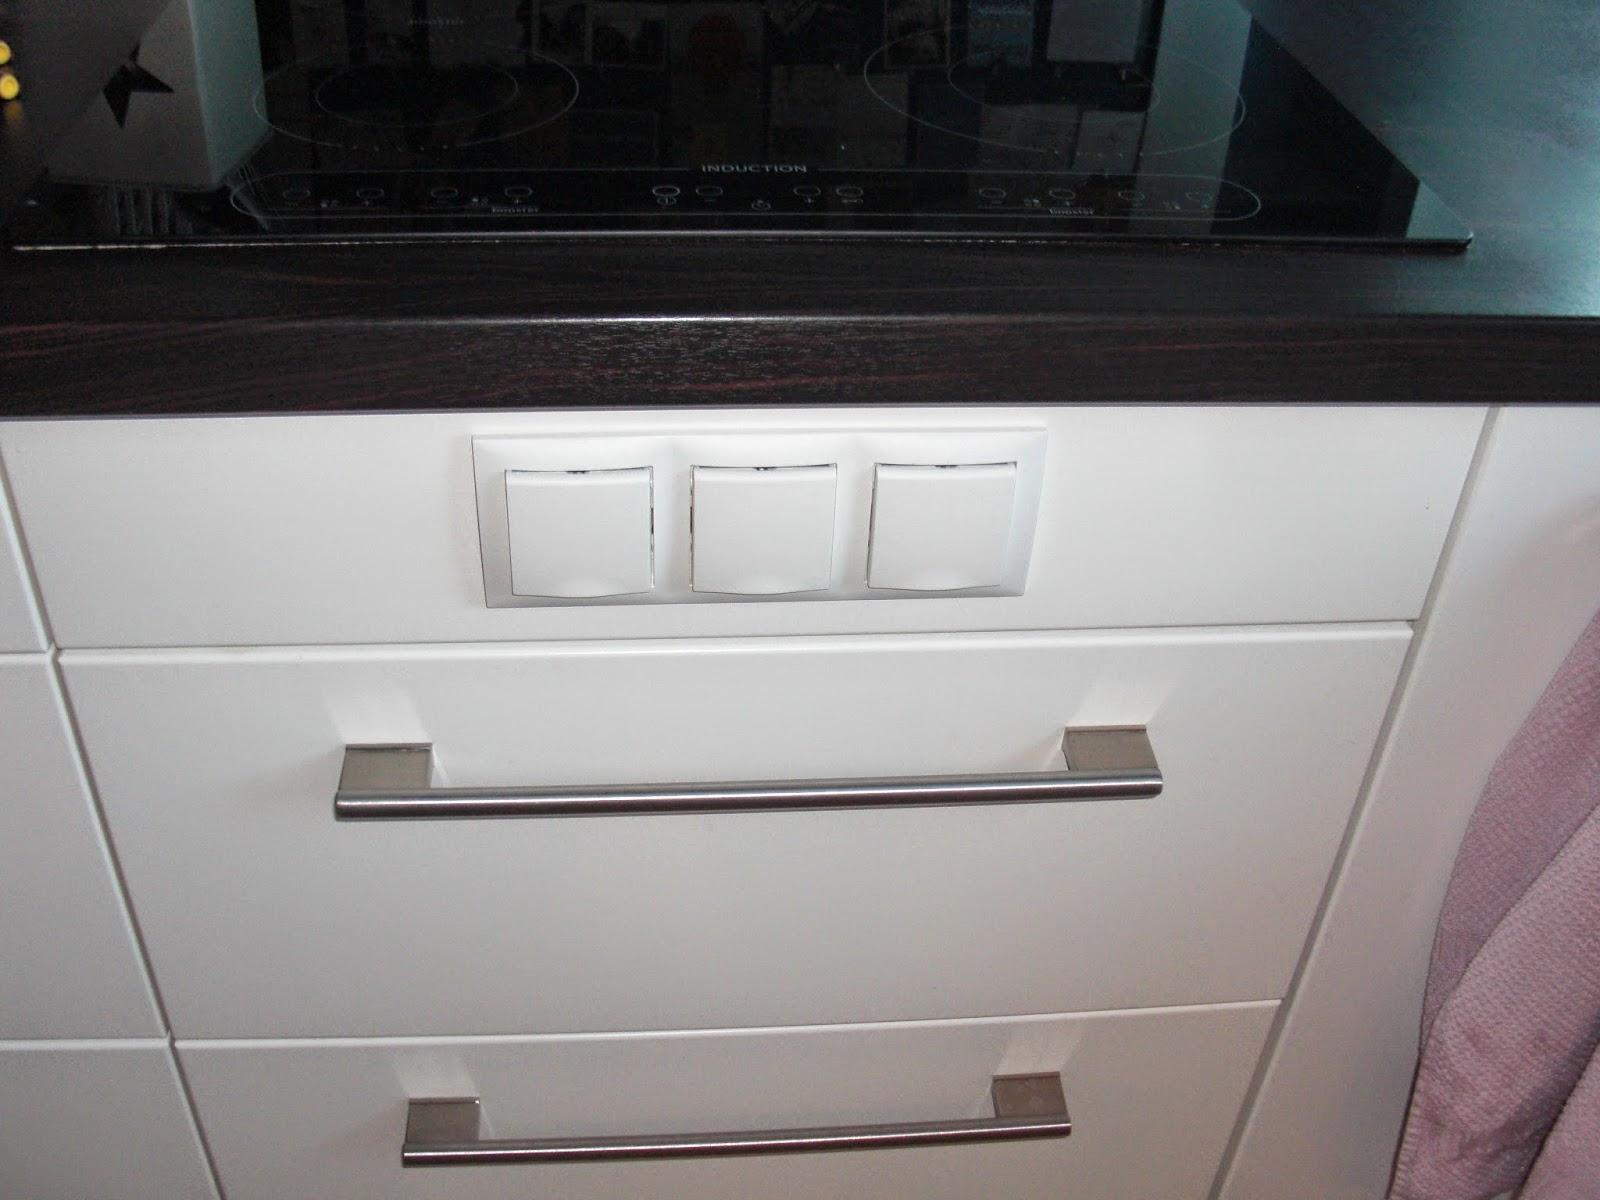 steckdosen verlegen k che ikea unterbauleuchten k che siemens spritzschutz eigenes foto. Black Bedroom Furniture Sets. Home Design Ideas